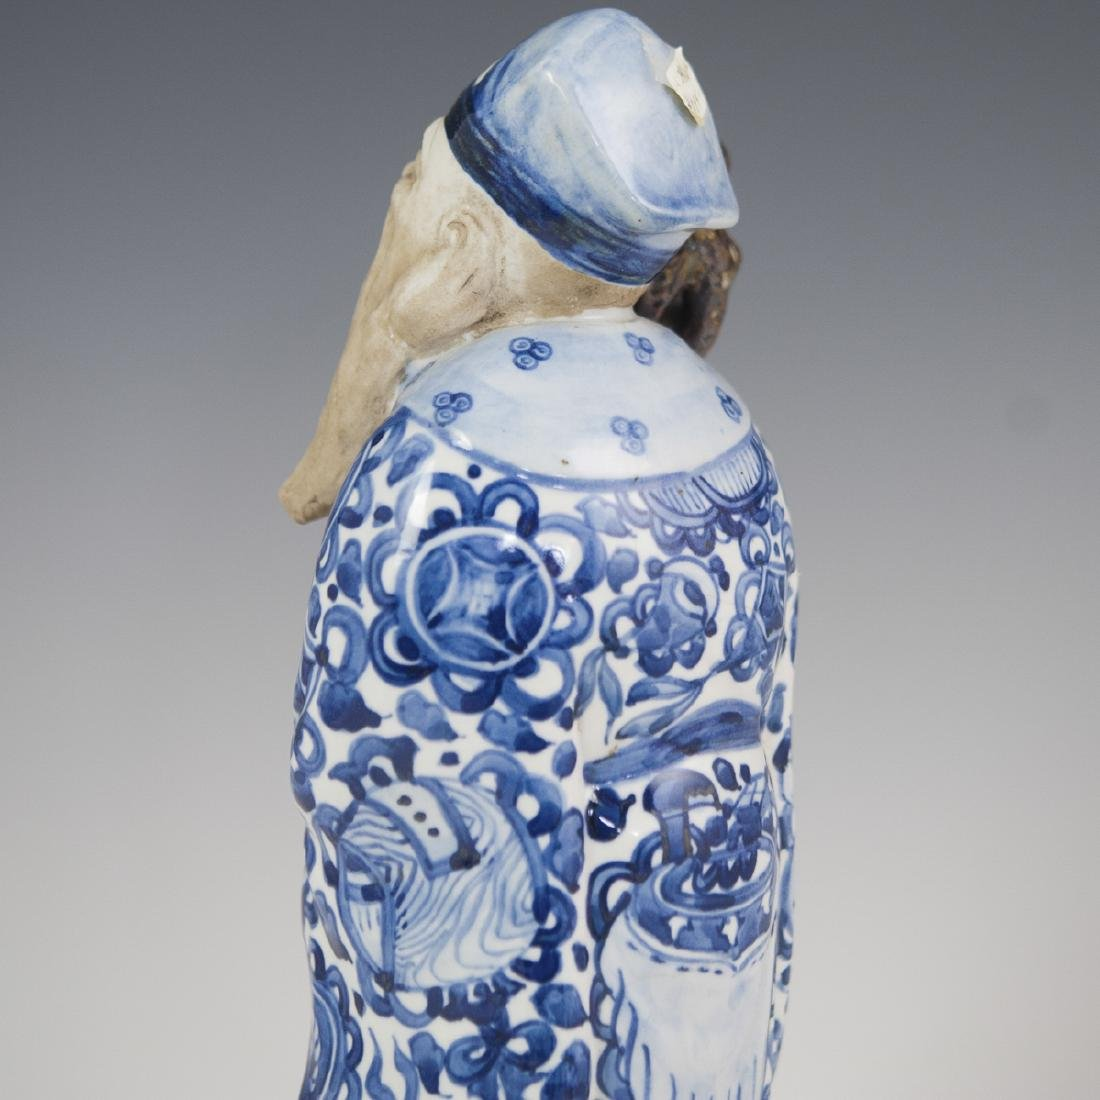 Chinese Glazed Pottery Shou Xing Figurine - 4